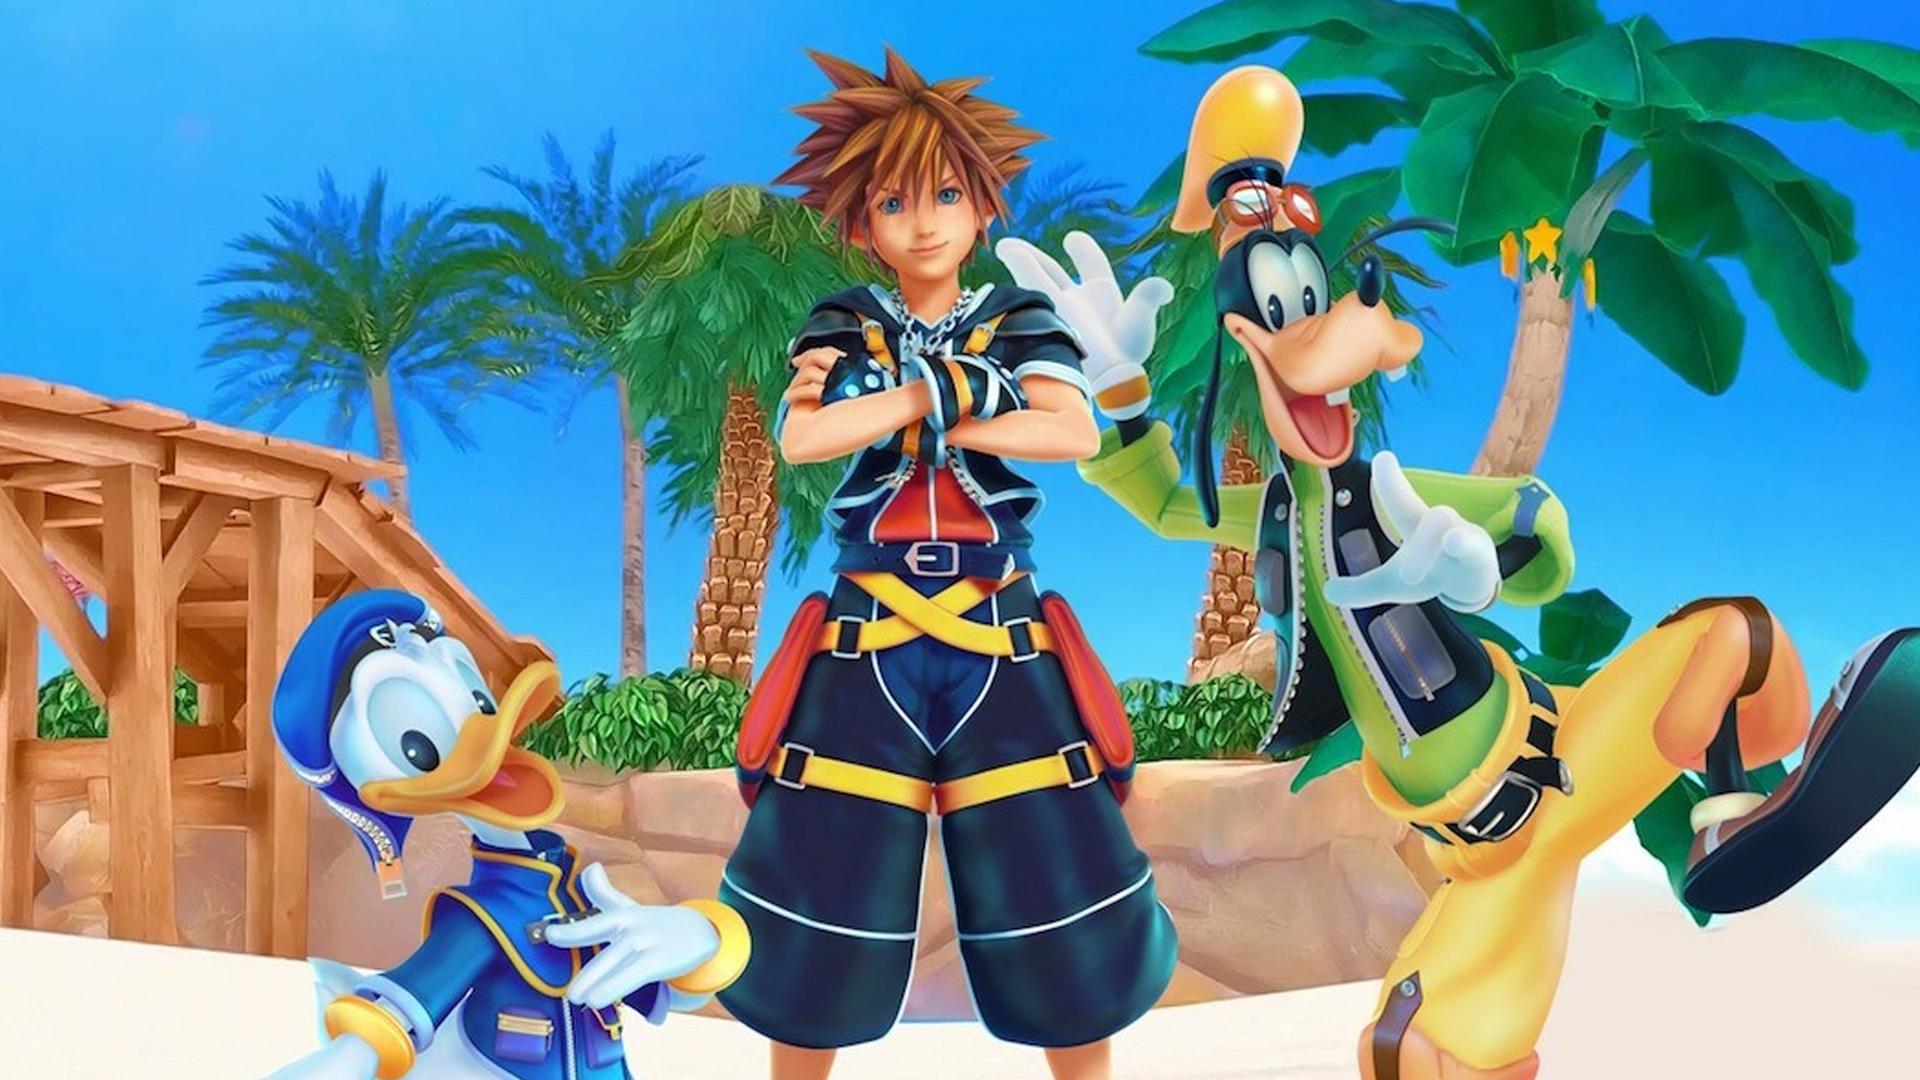 Kingdom Hearts III Is Nearly Here